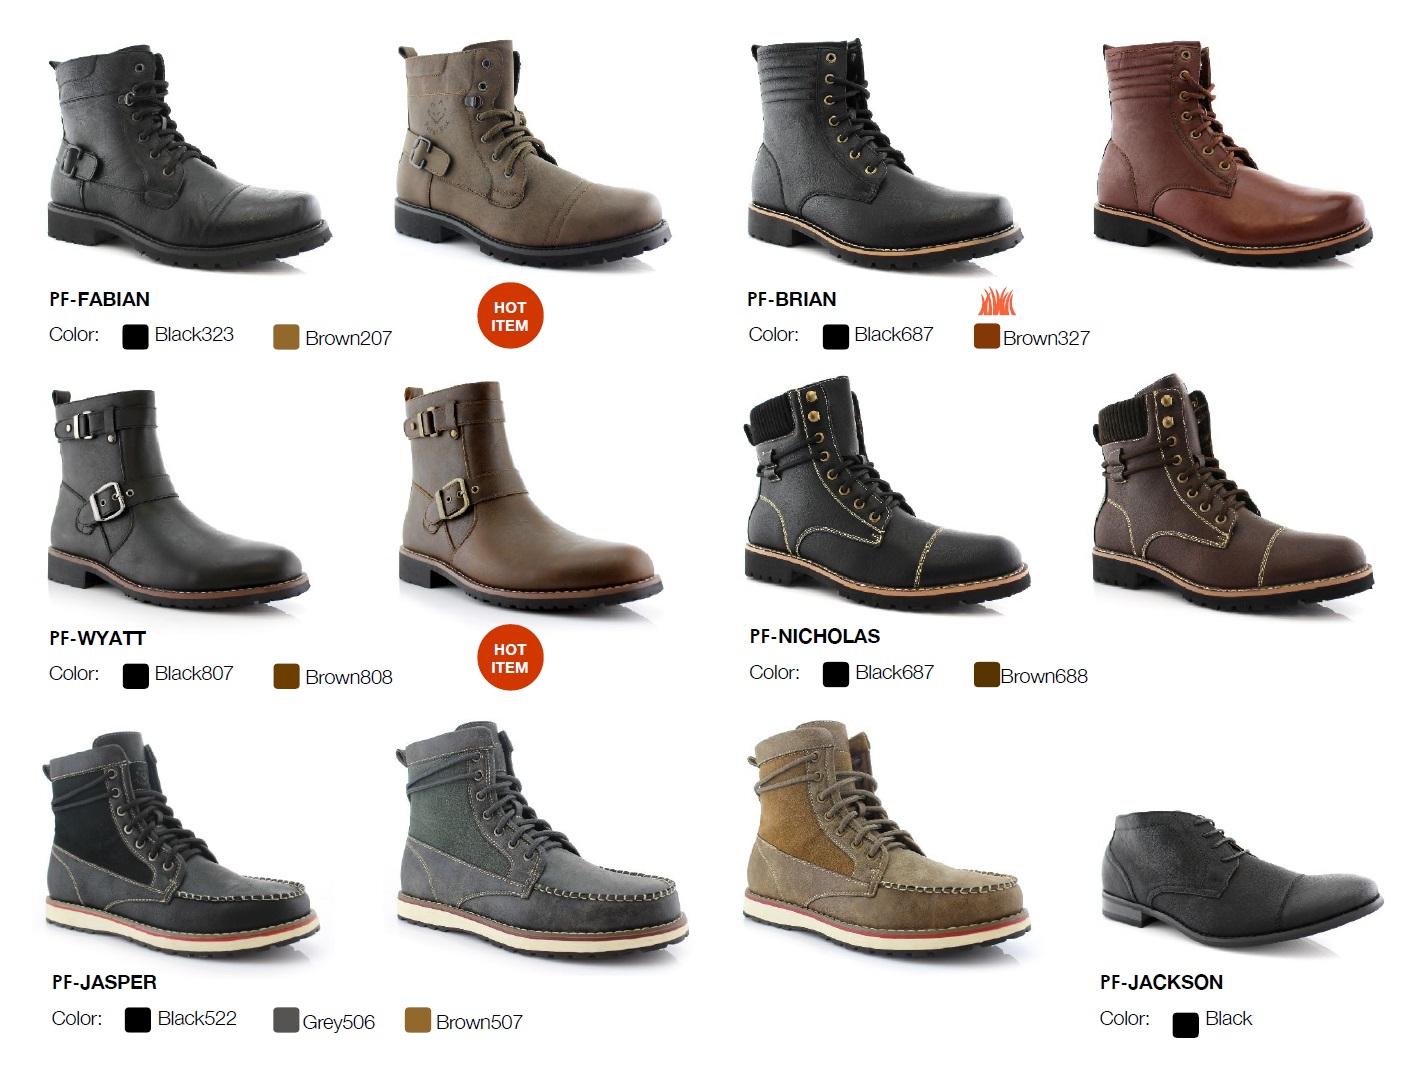 Nantlis Vol 43 Zapatos para Hombres Mayoreo Wholesale men shoes Catalogo Polar Fox Footwear_Page_07